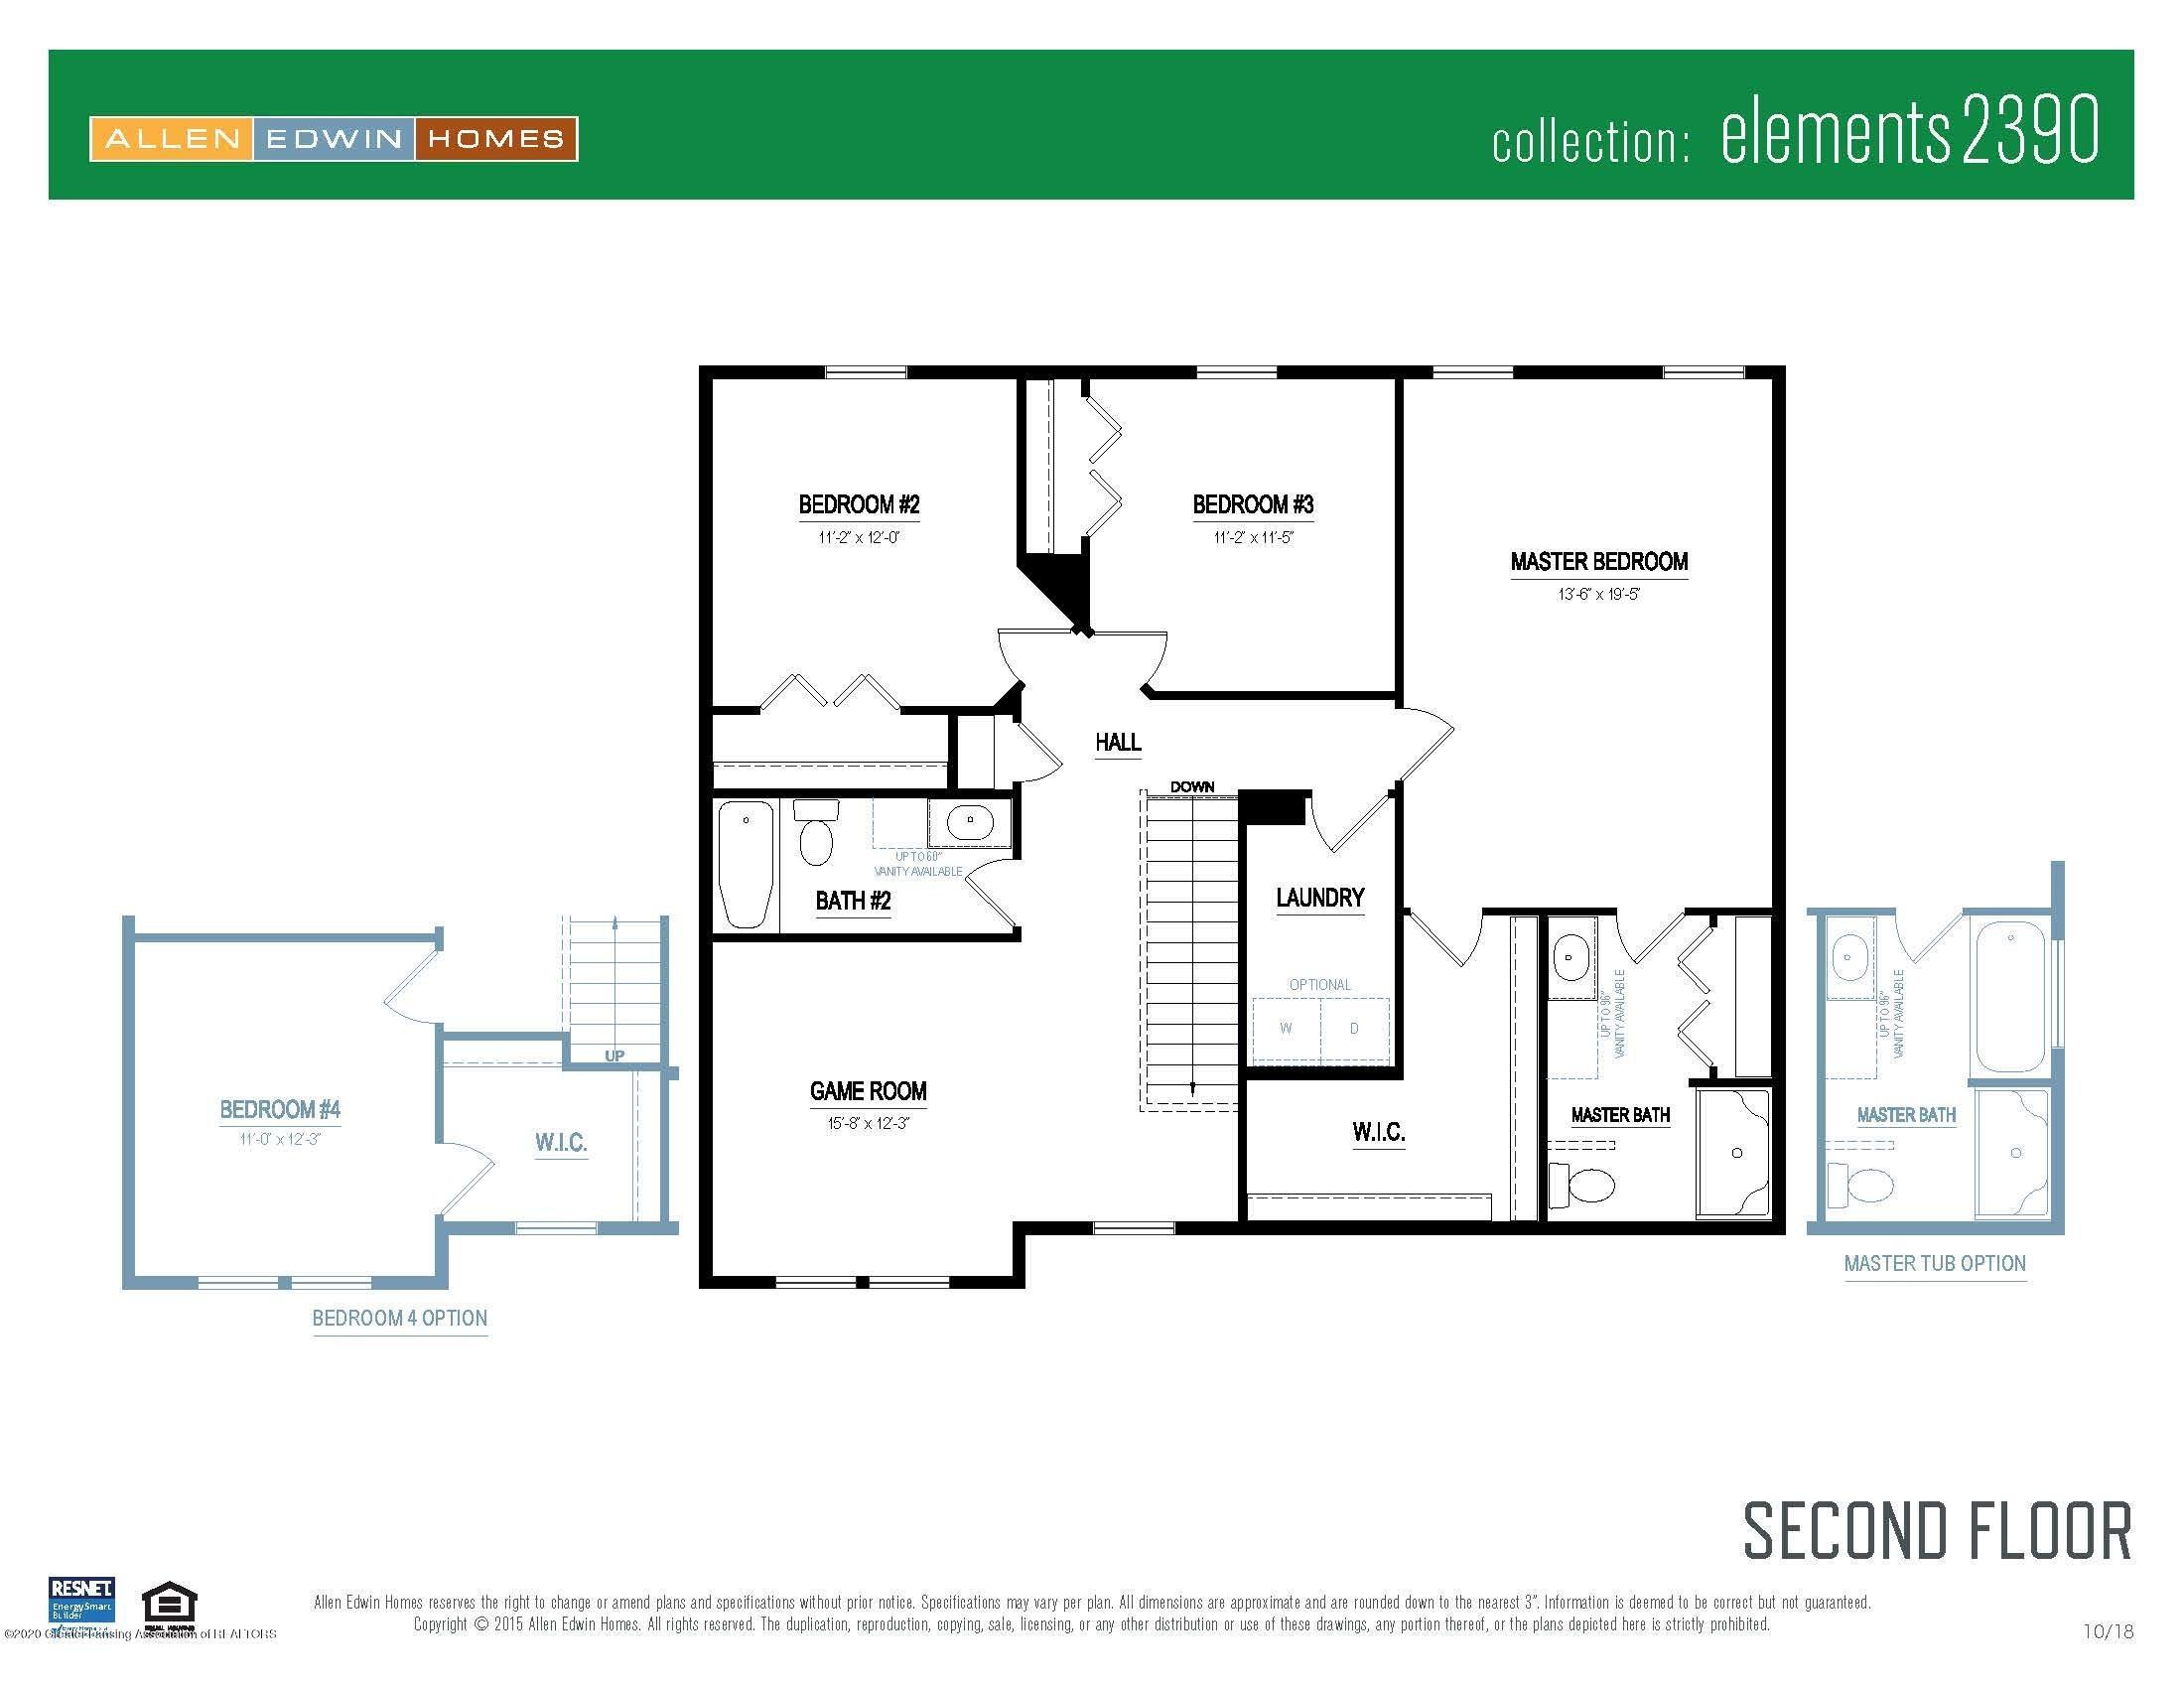 6463 Savanna Way - Elements 2390 V8.0a Second Floor - 6